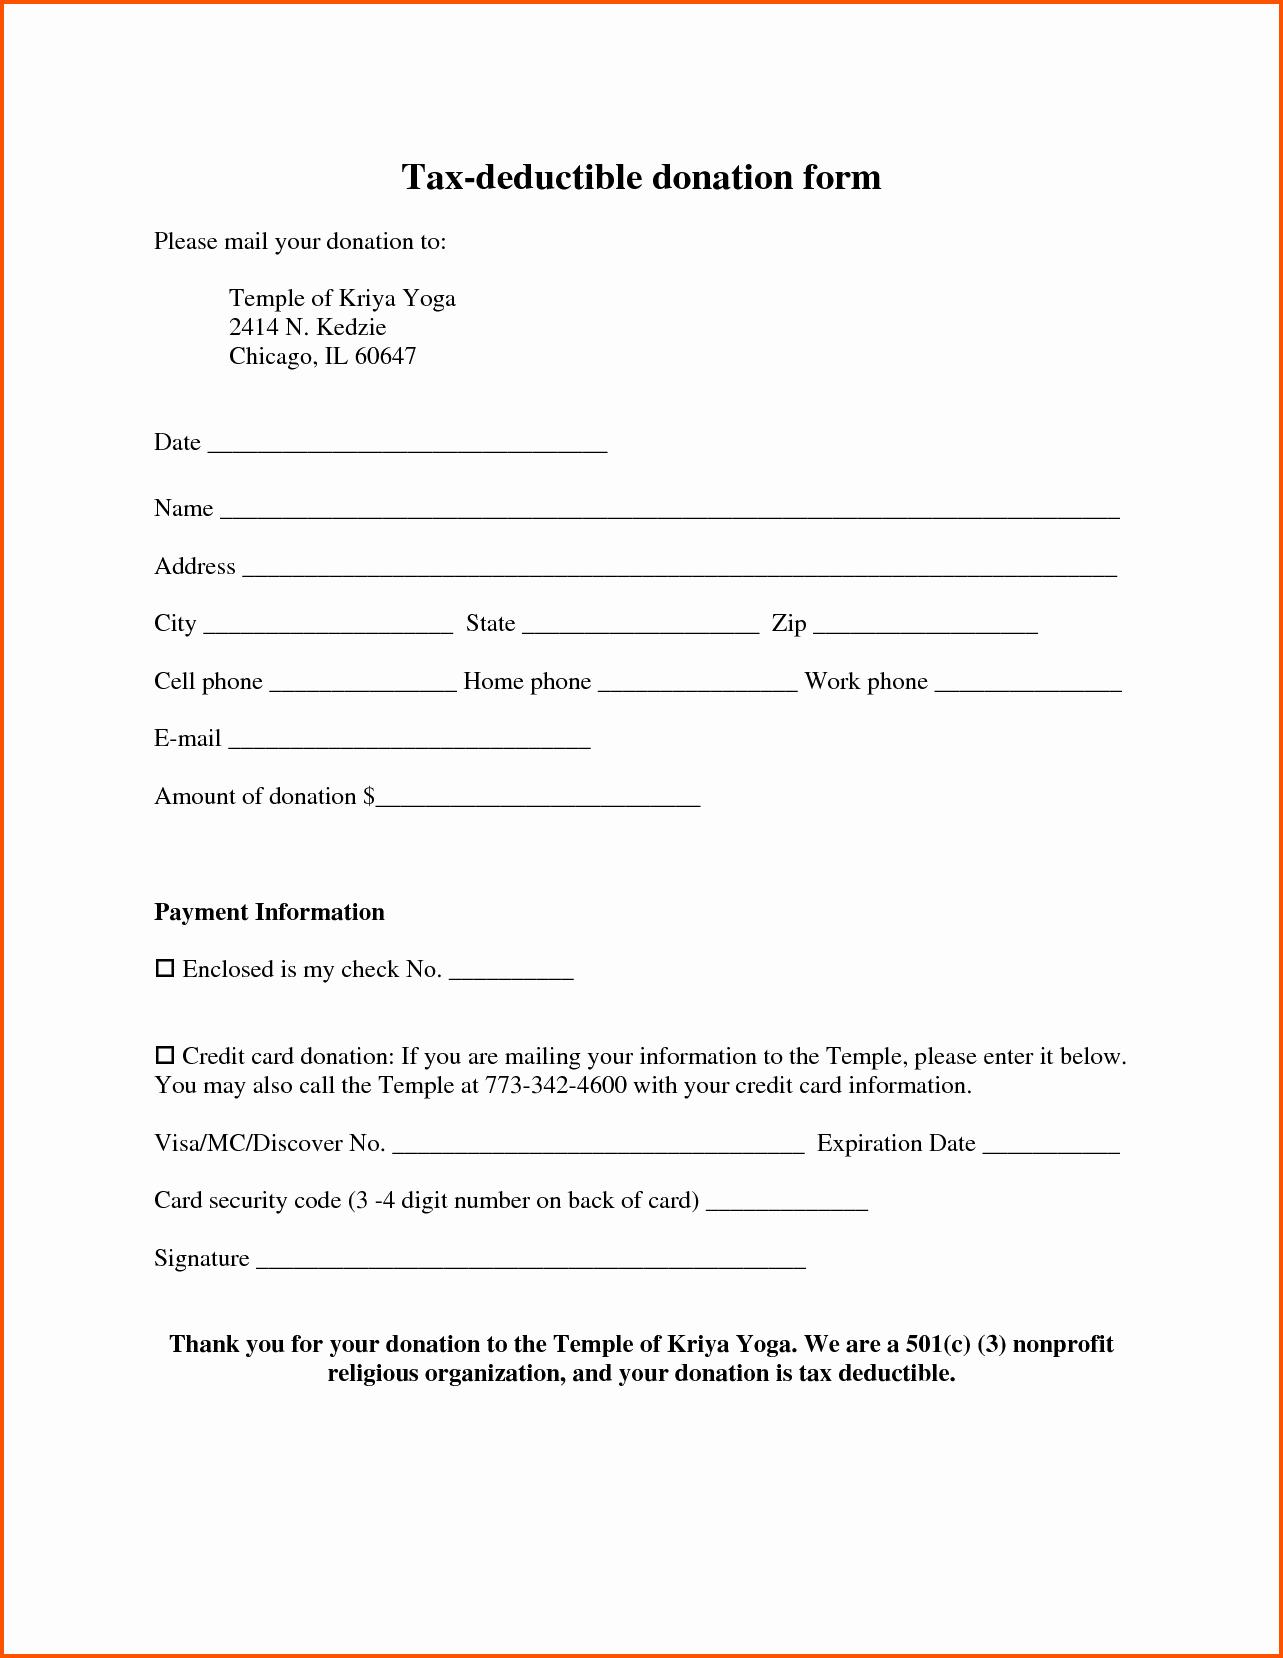 Tax Deductible Donation Receipt Template Inspirational Professional Receipt Portablegasgrillweber